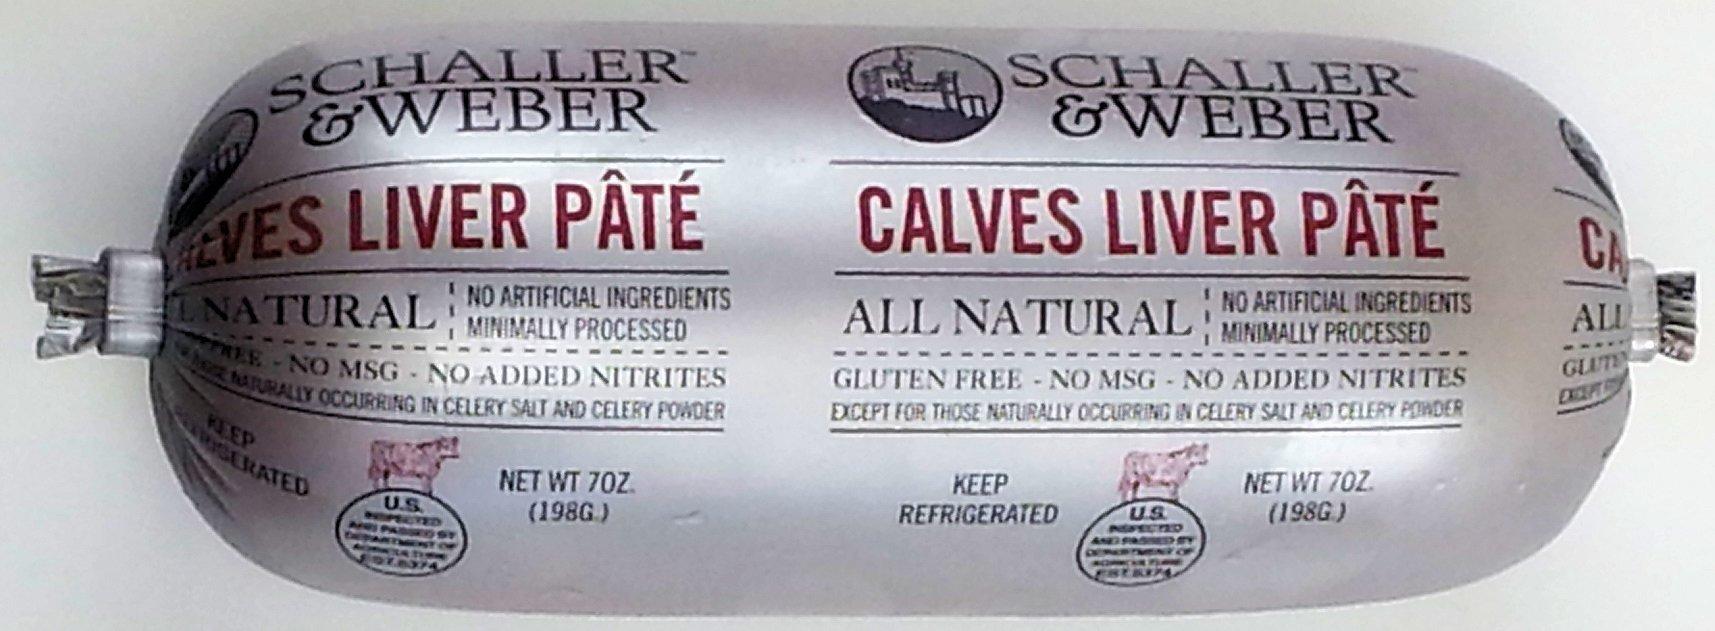 All Natural Calves Liver Pate (6 pack)